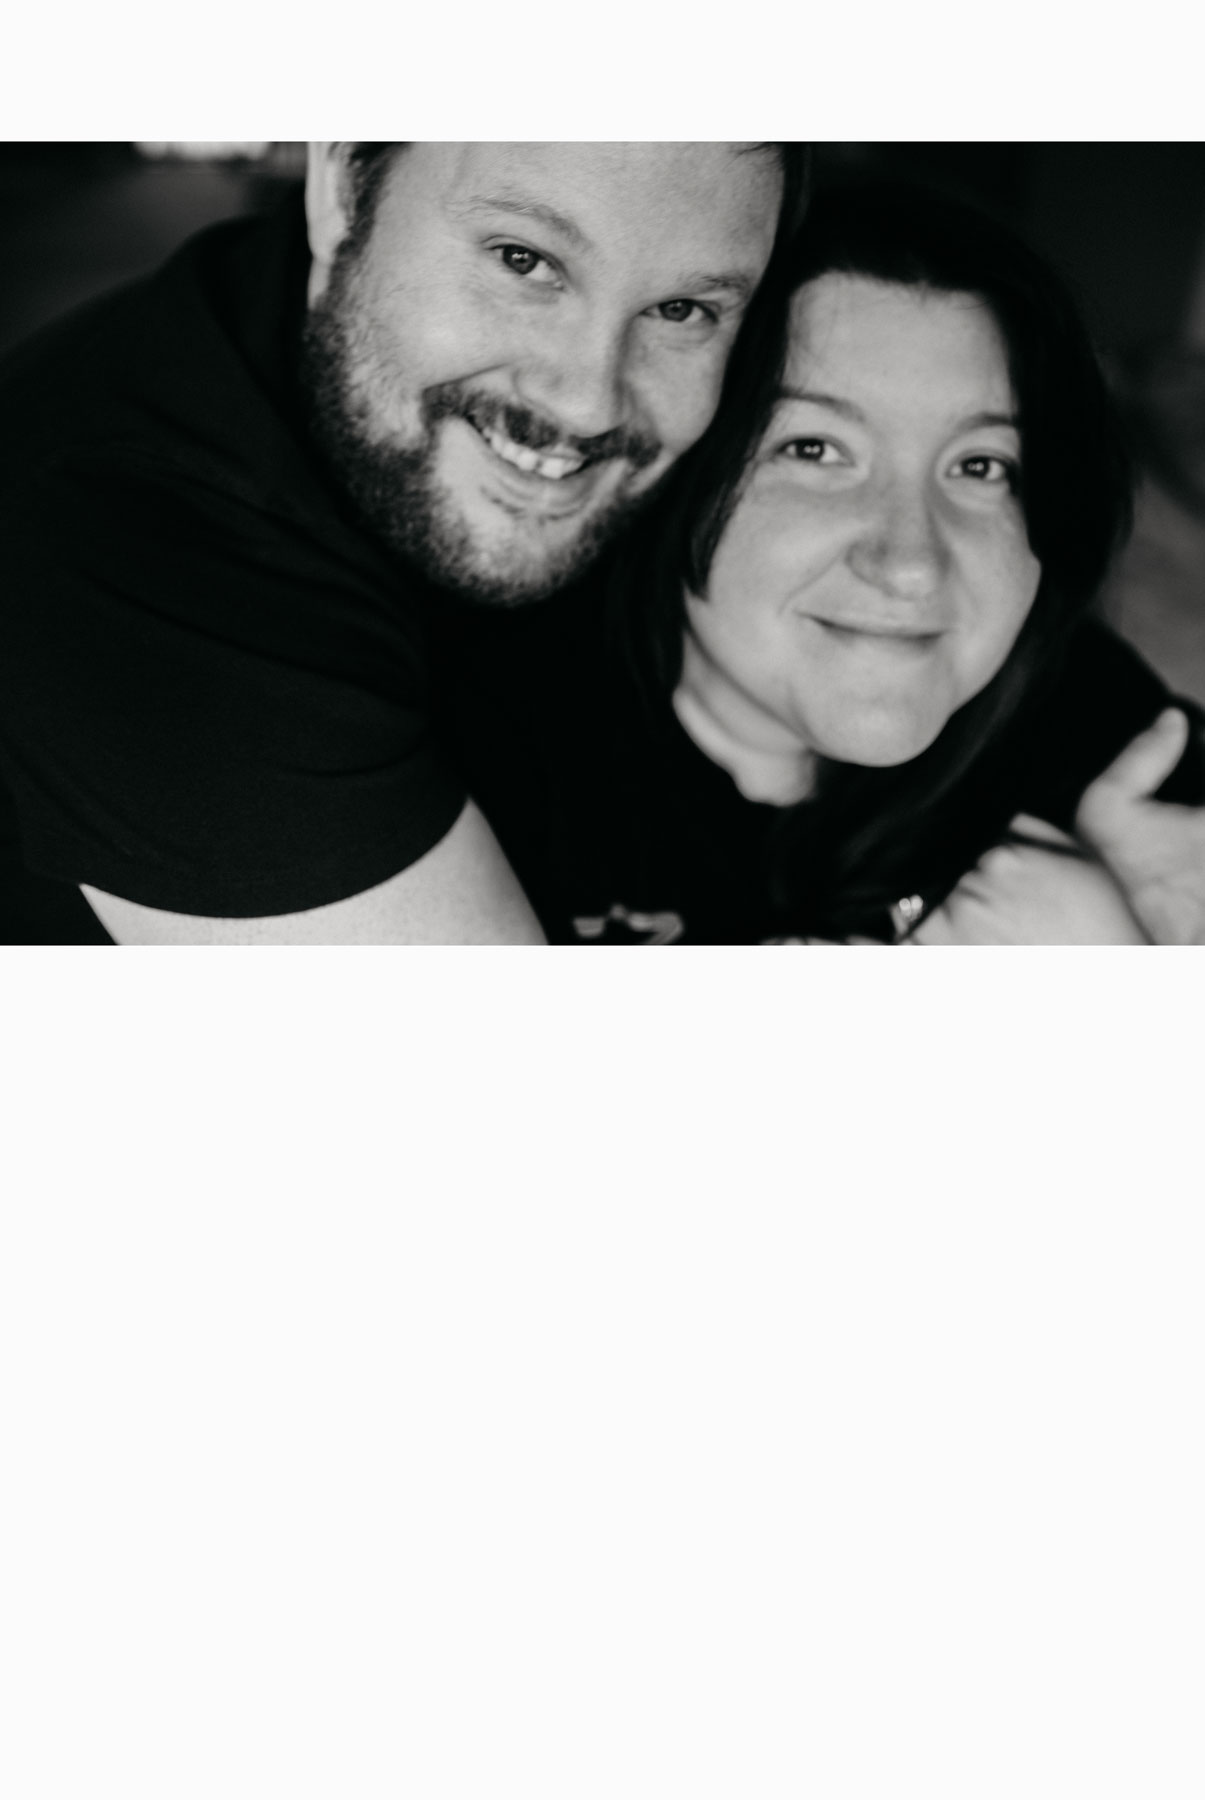 Jasmine and Paul Rottman - Chicago Wedding Photographers and Videographers